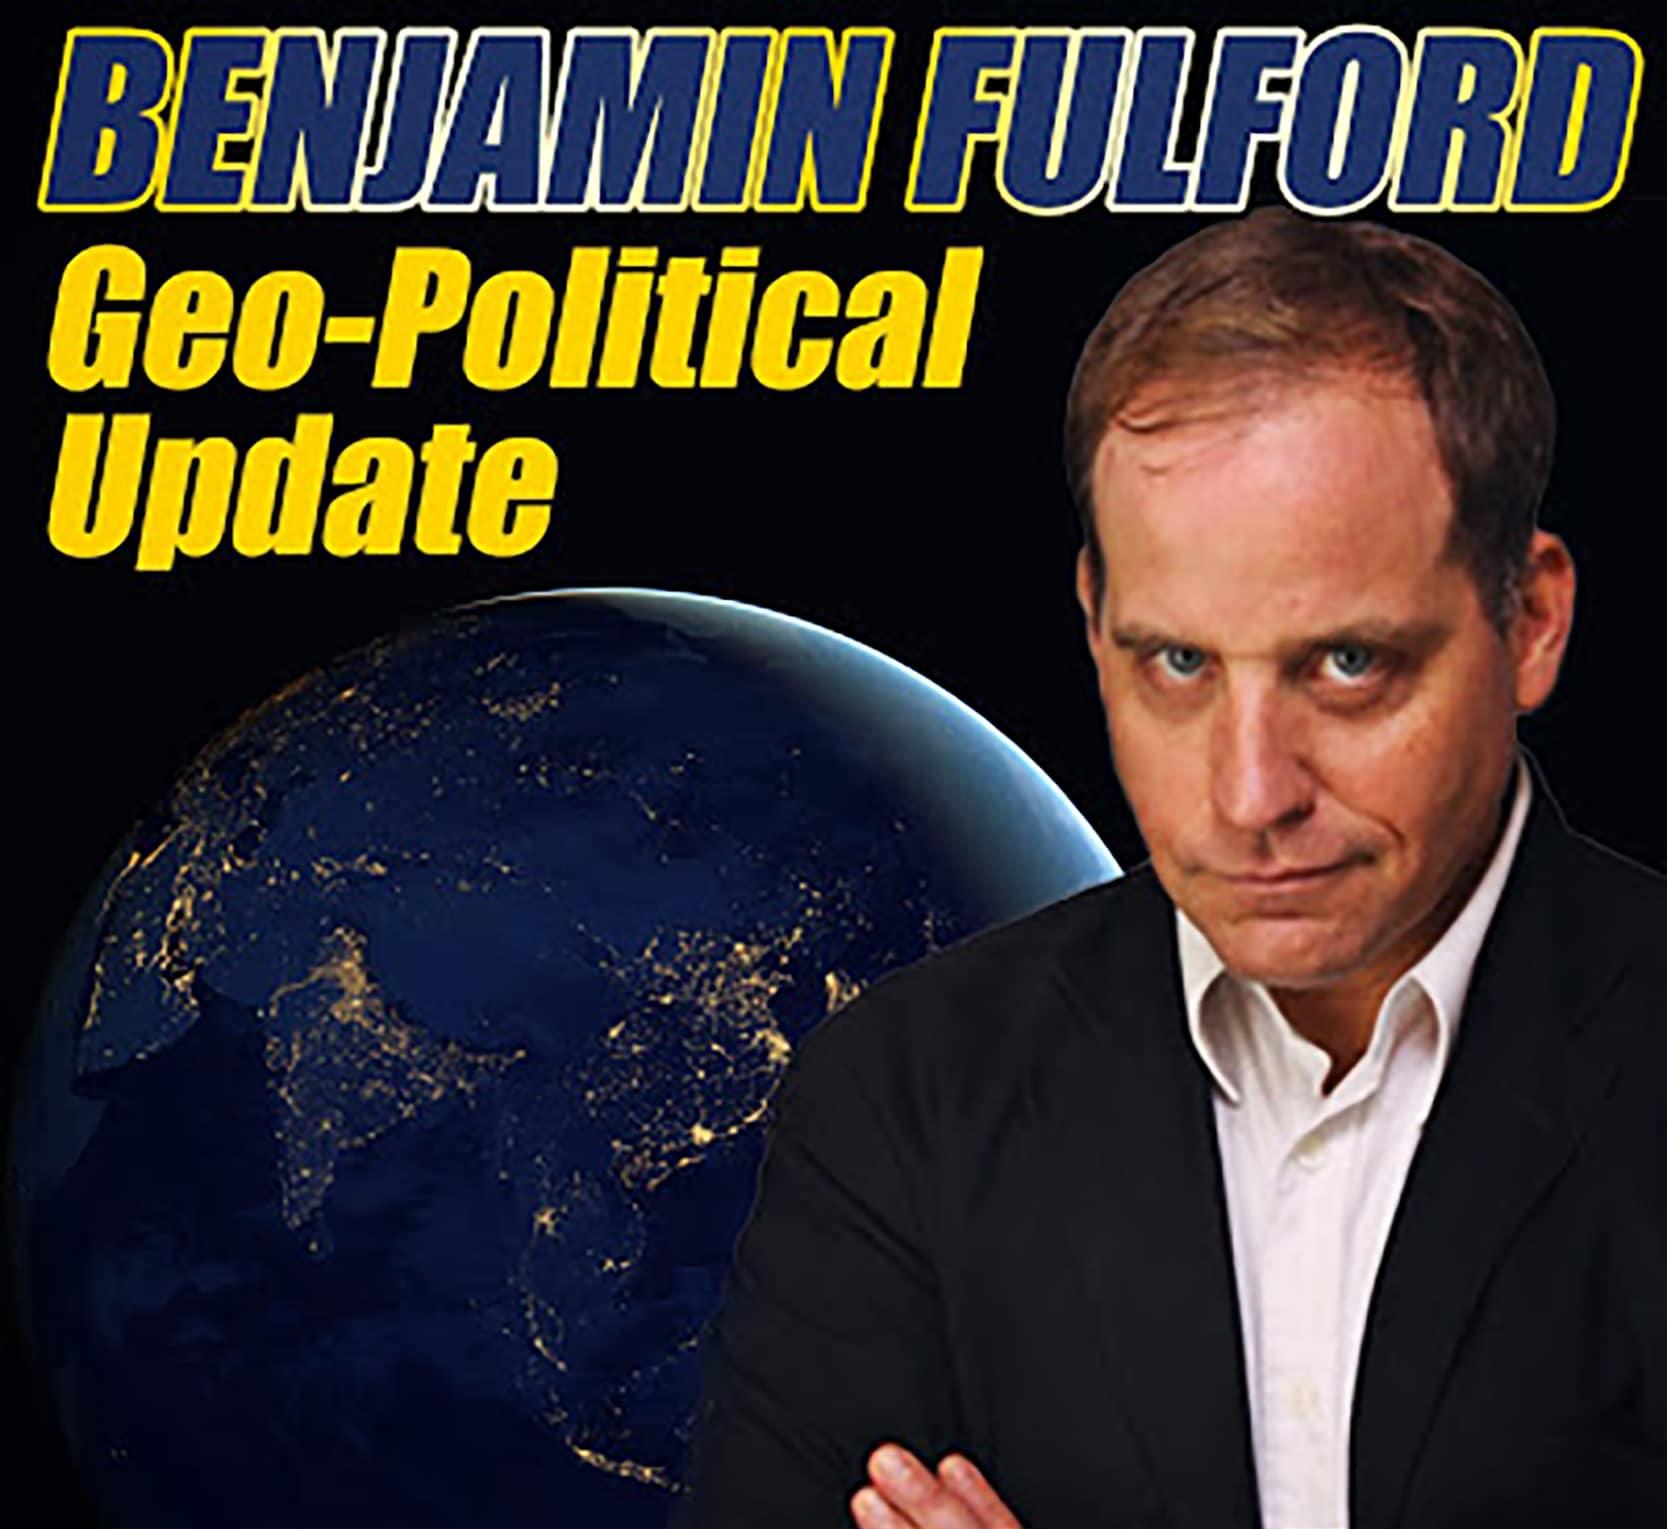 Benjamin-Fulford-Geo-Political-Updates-NEW-1.jpg